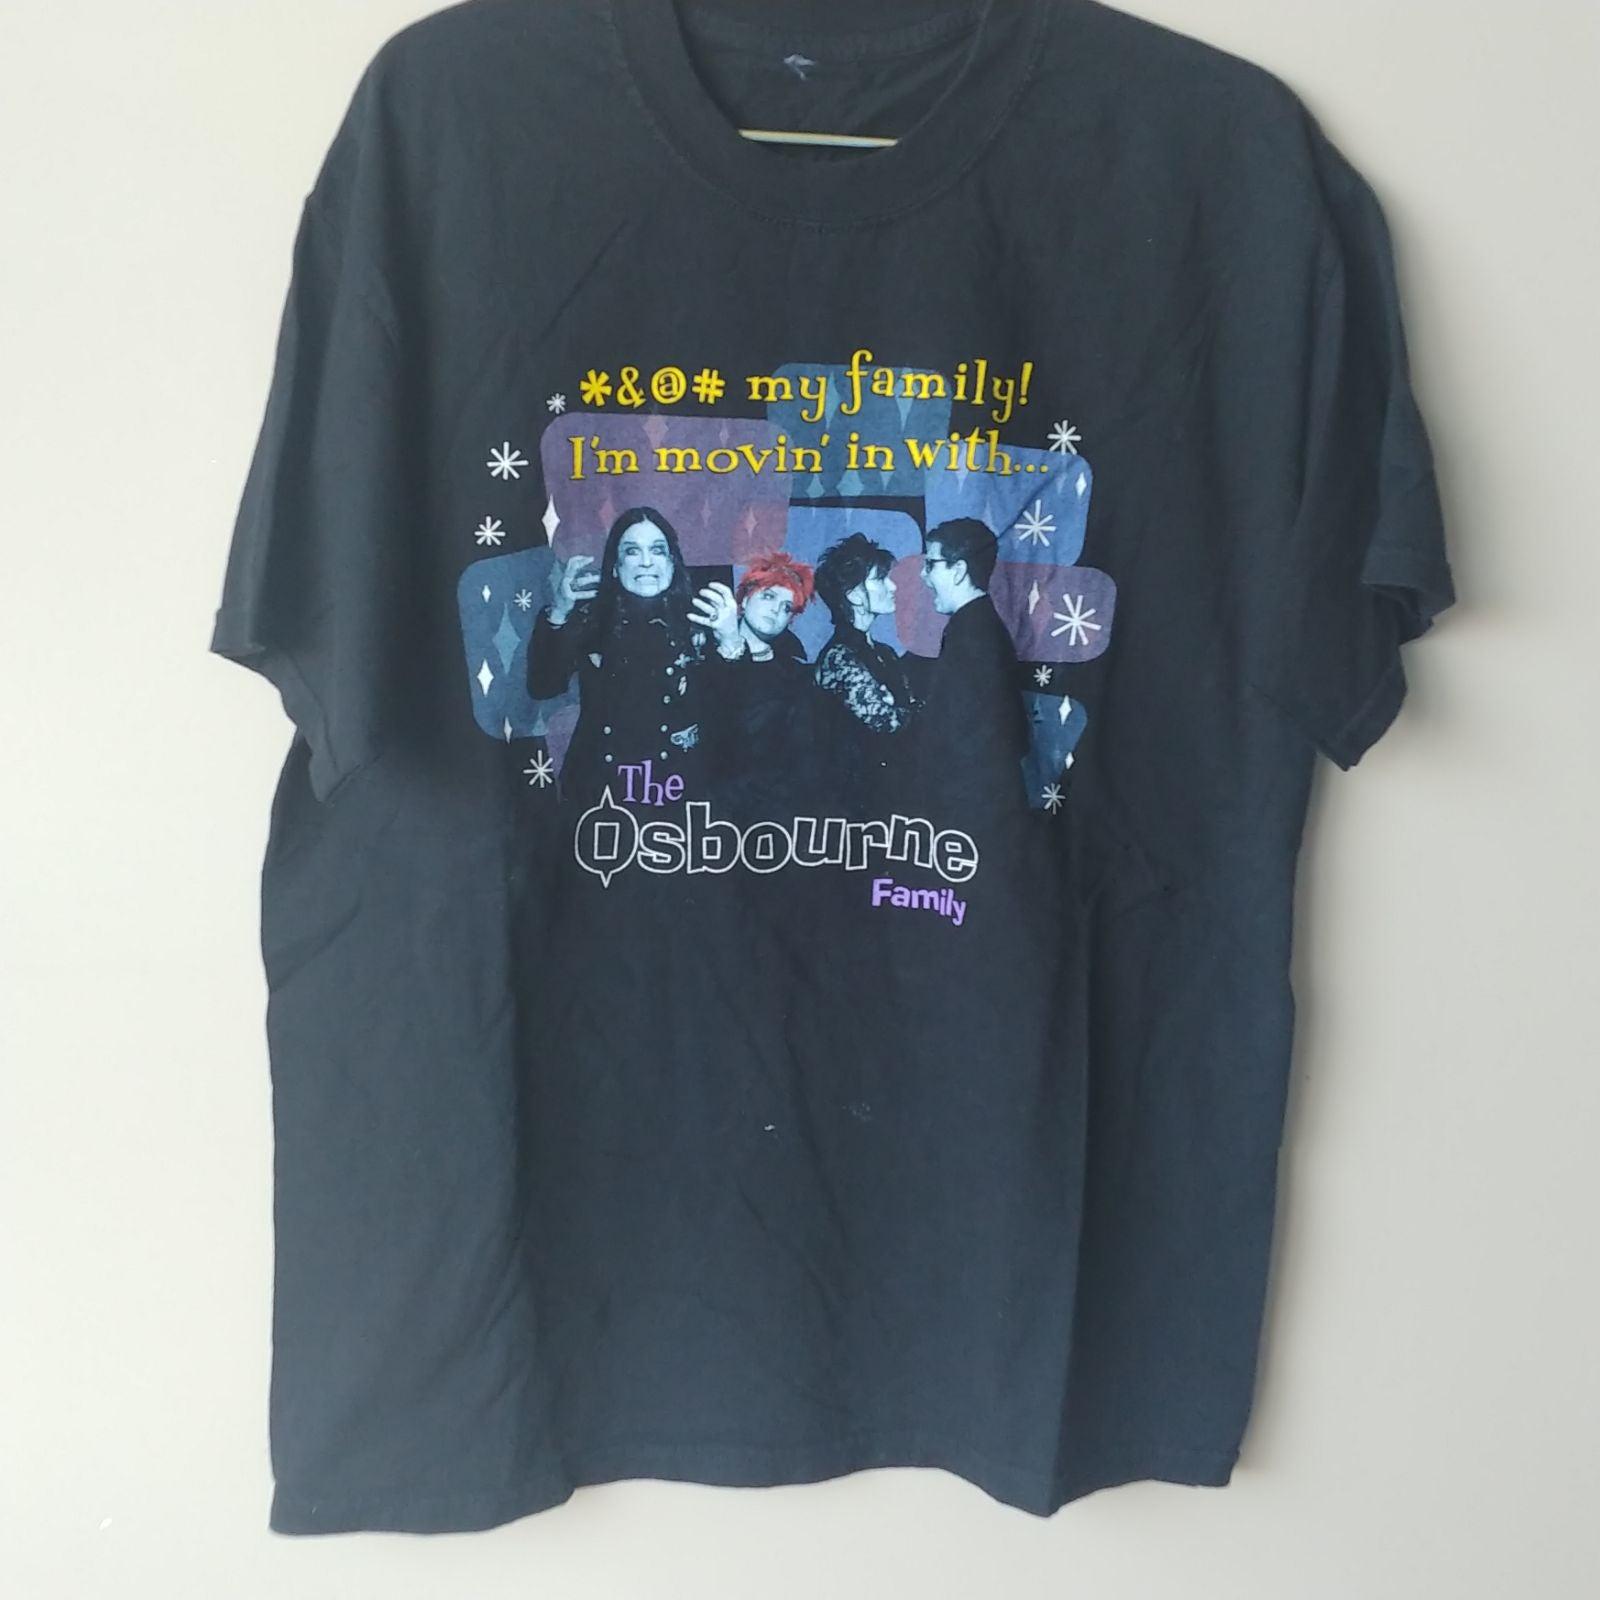 Vintage Ozzy osbourne tee shirt